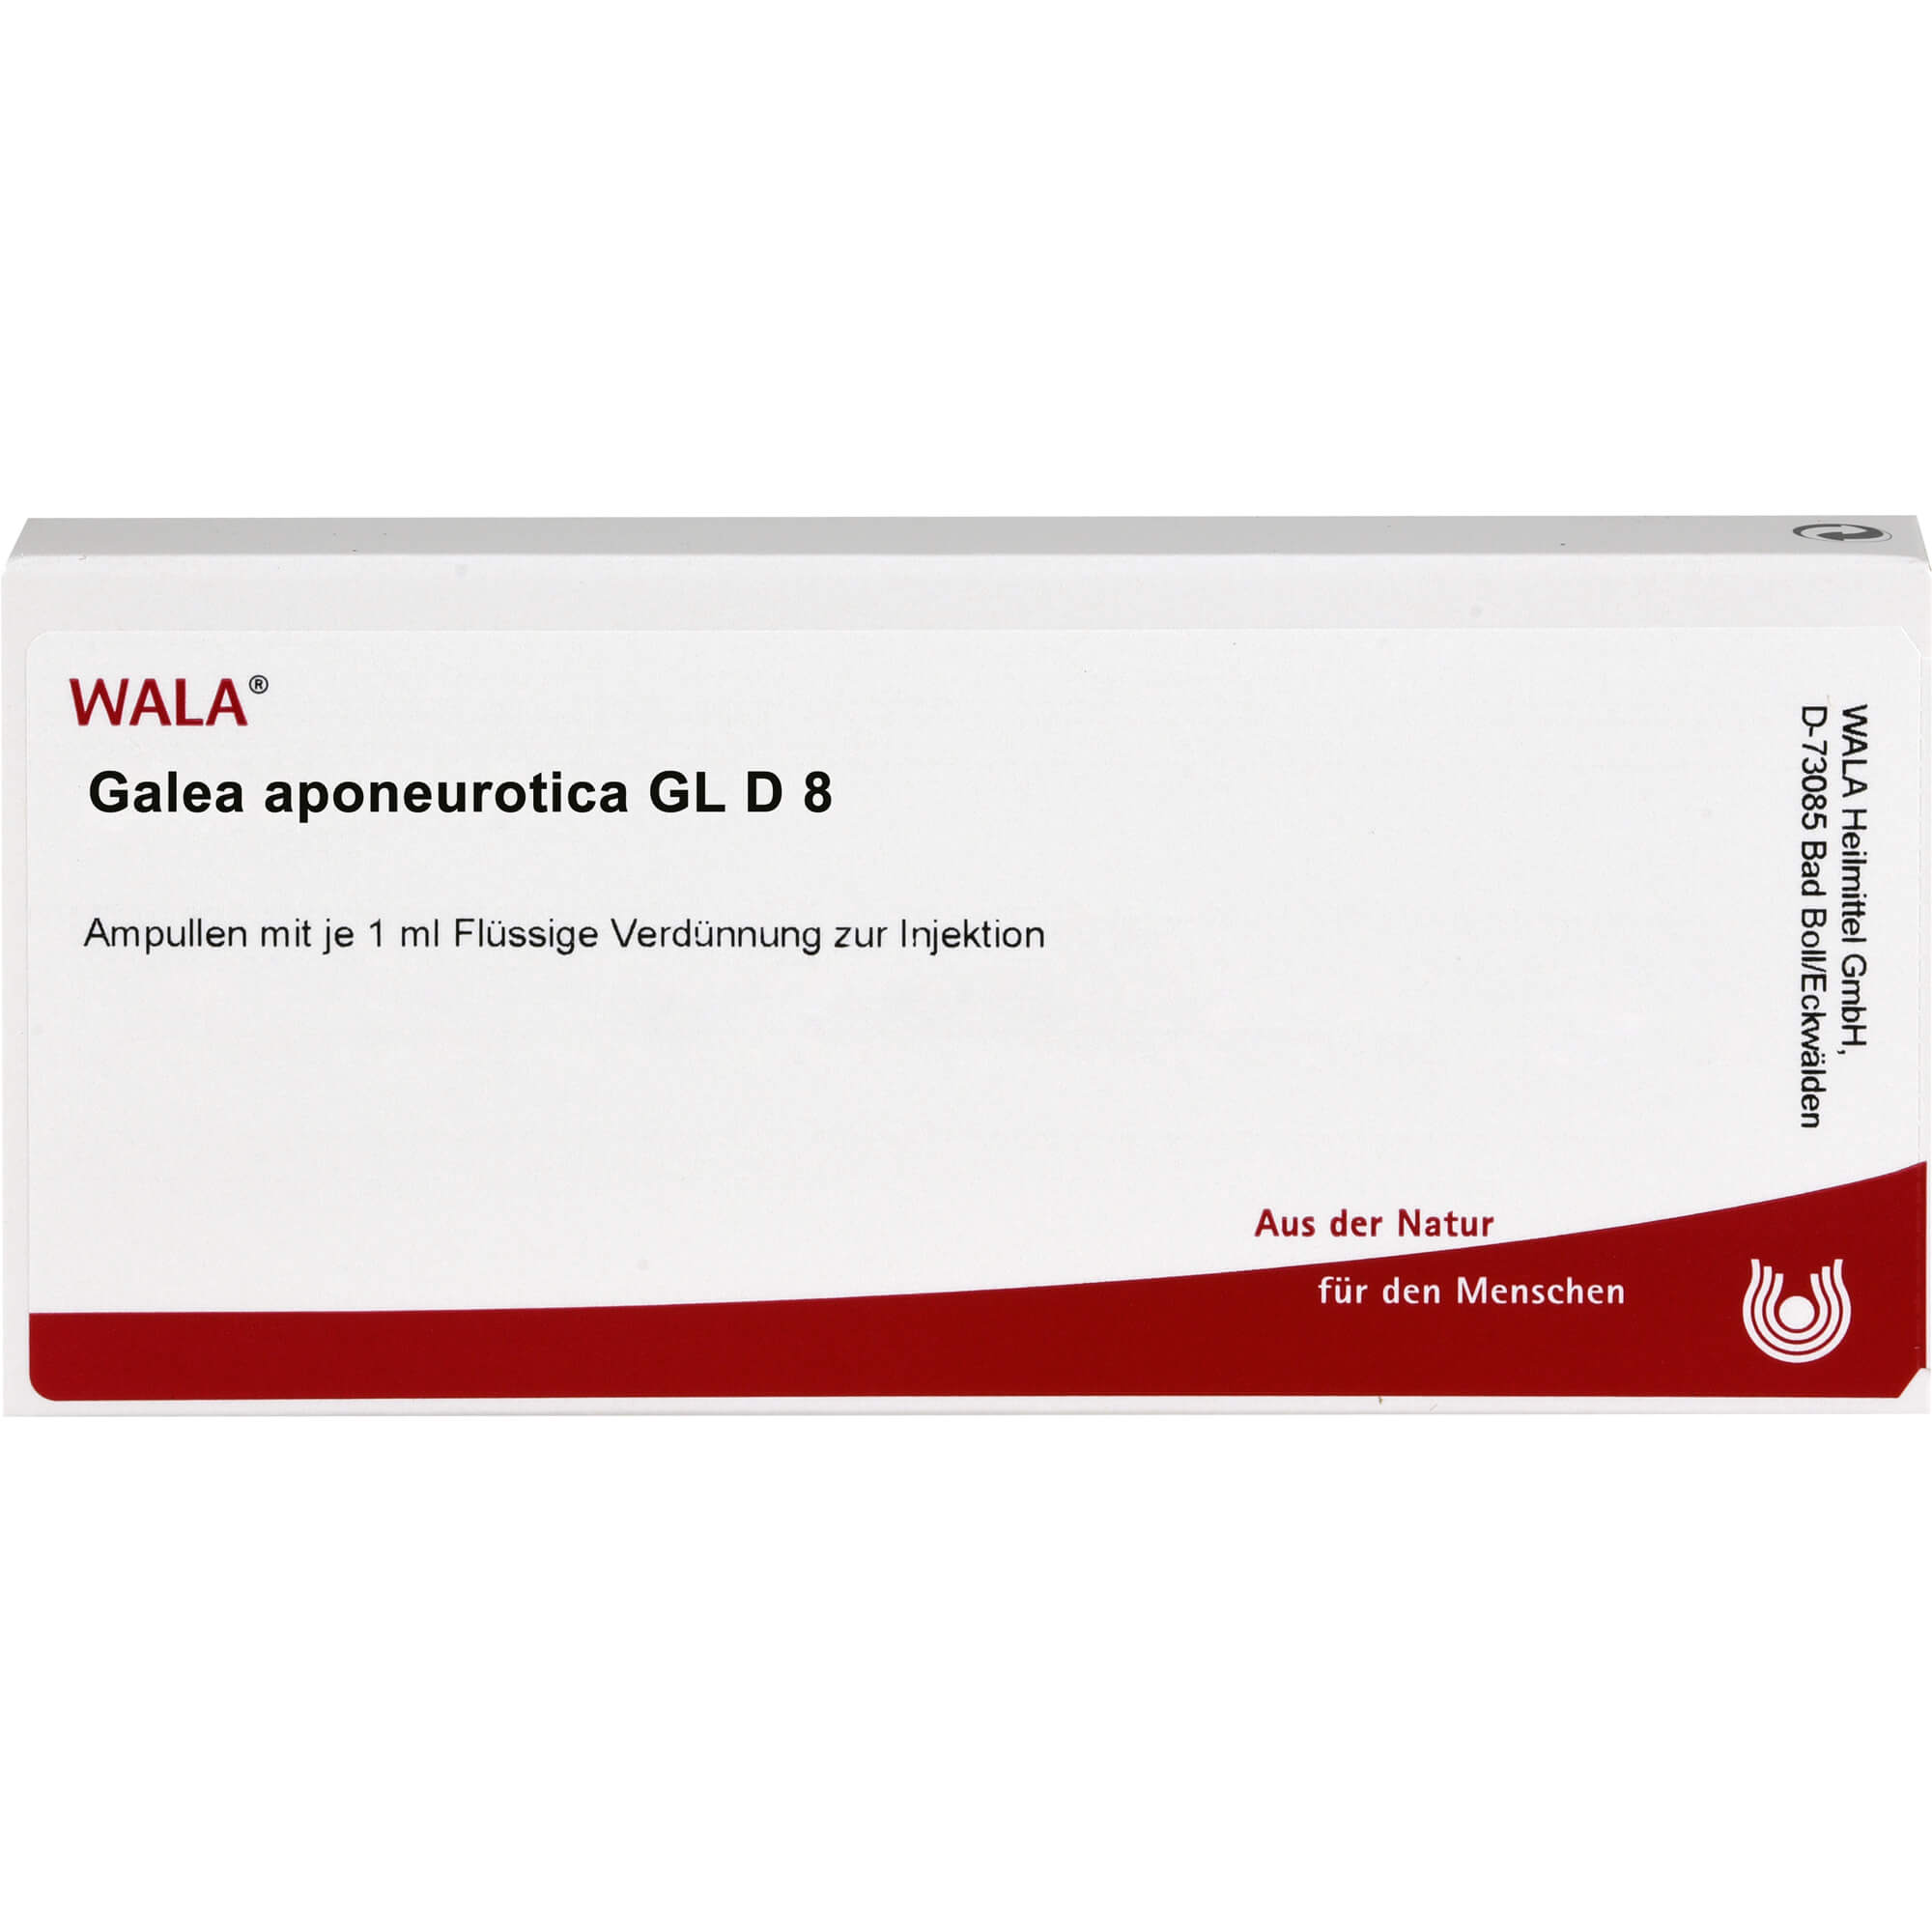 GALEA aponeurotica GL D 8 Ampullen